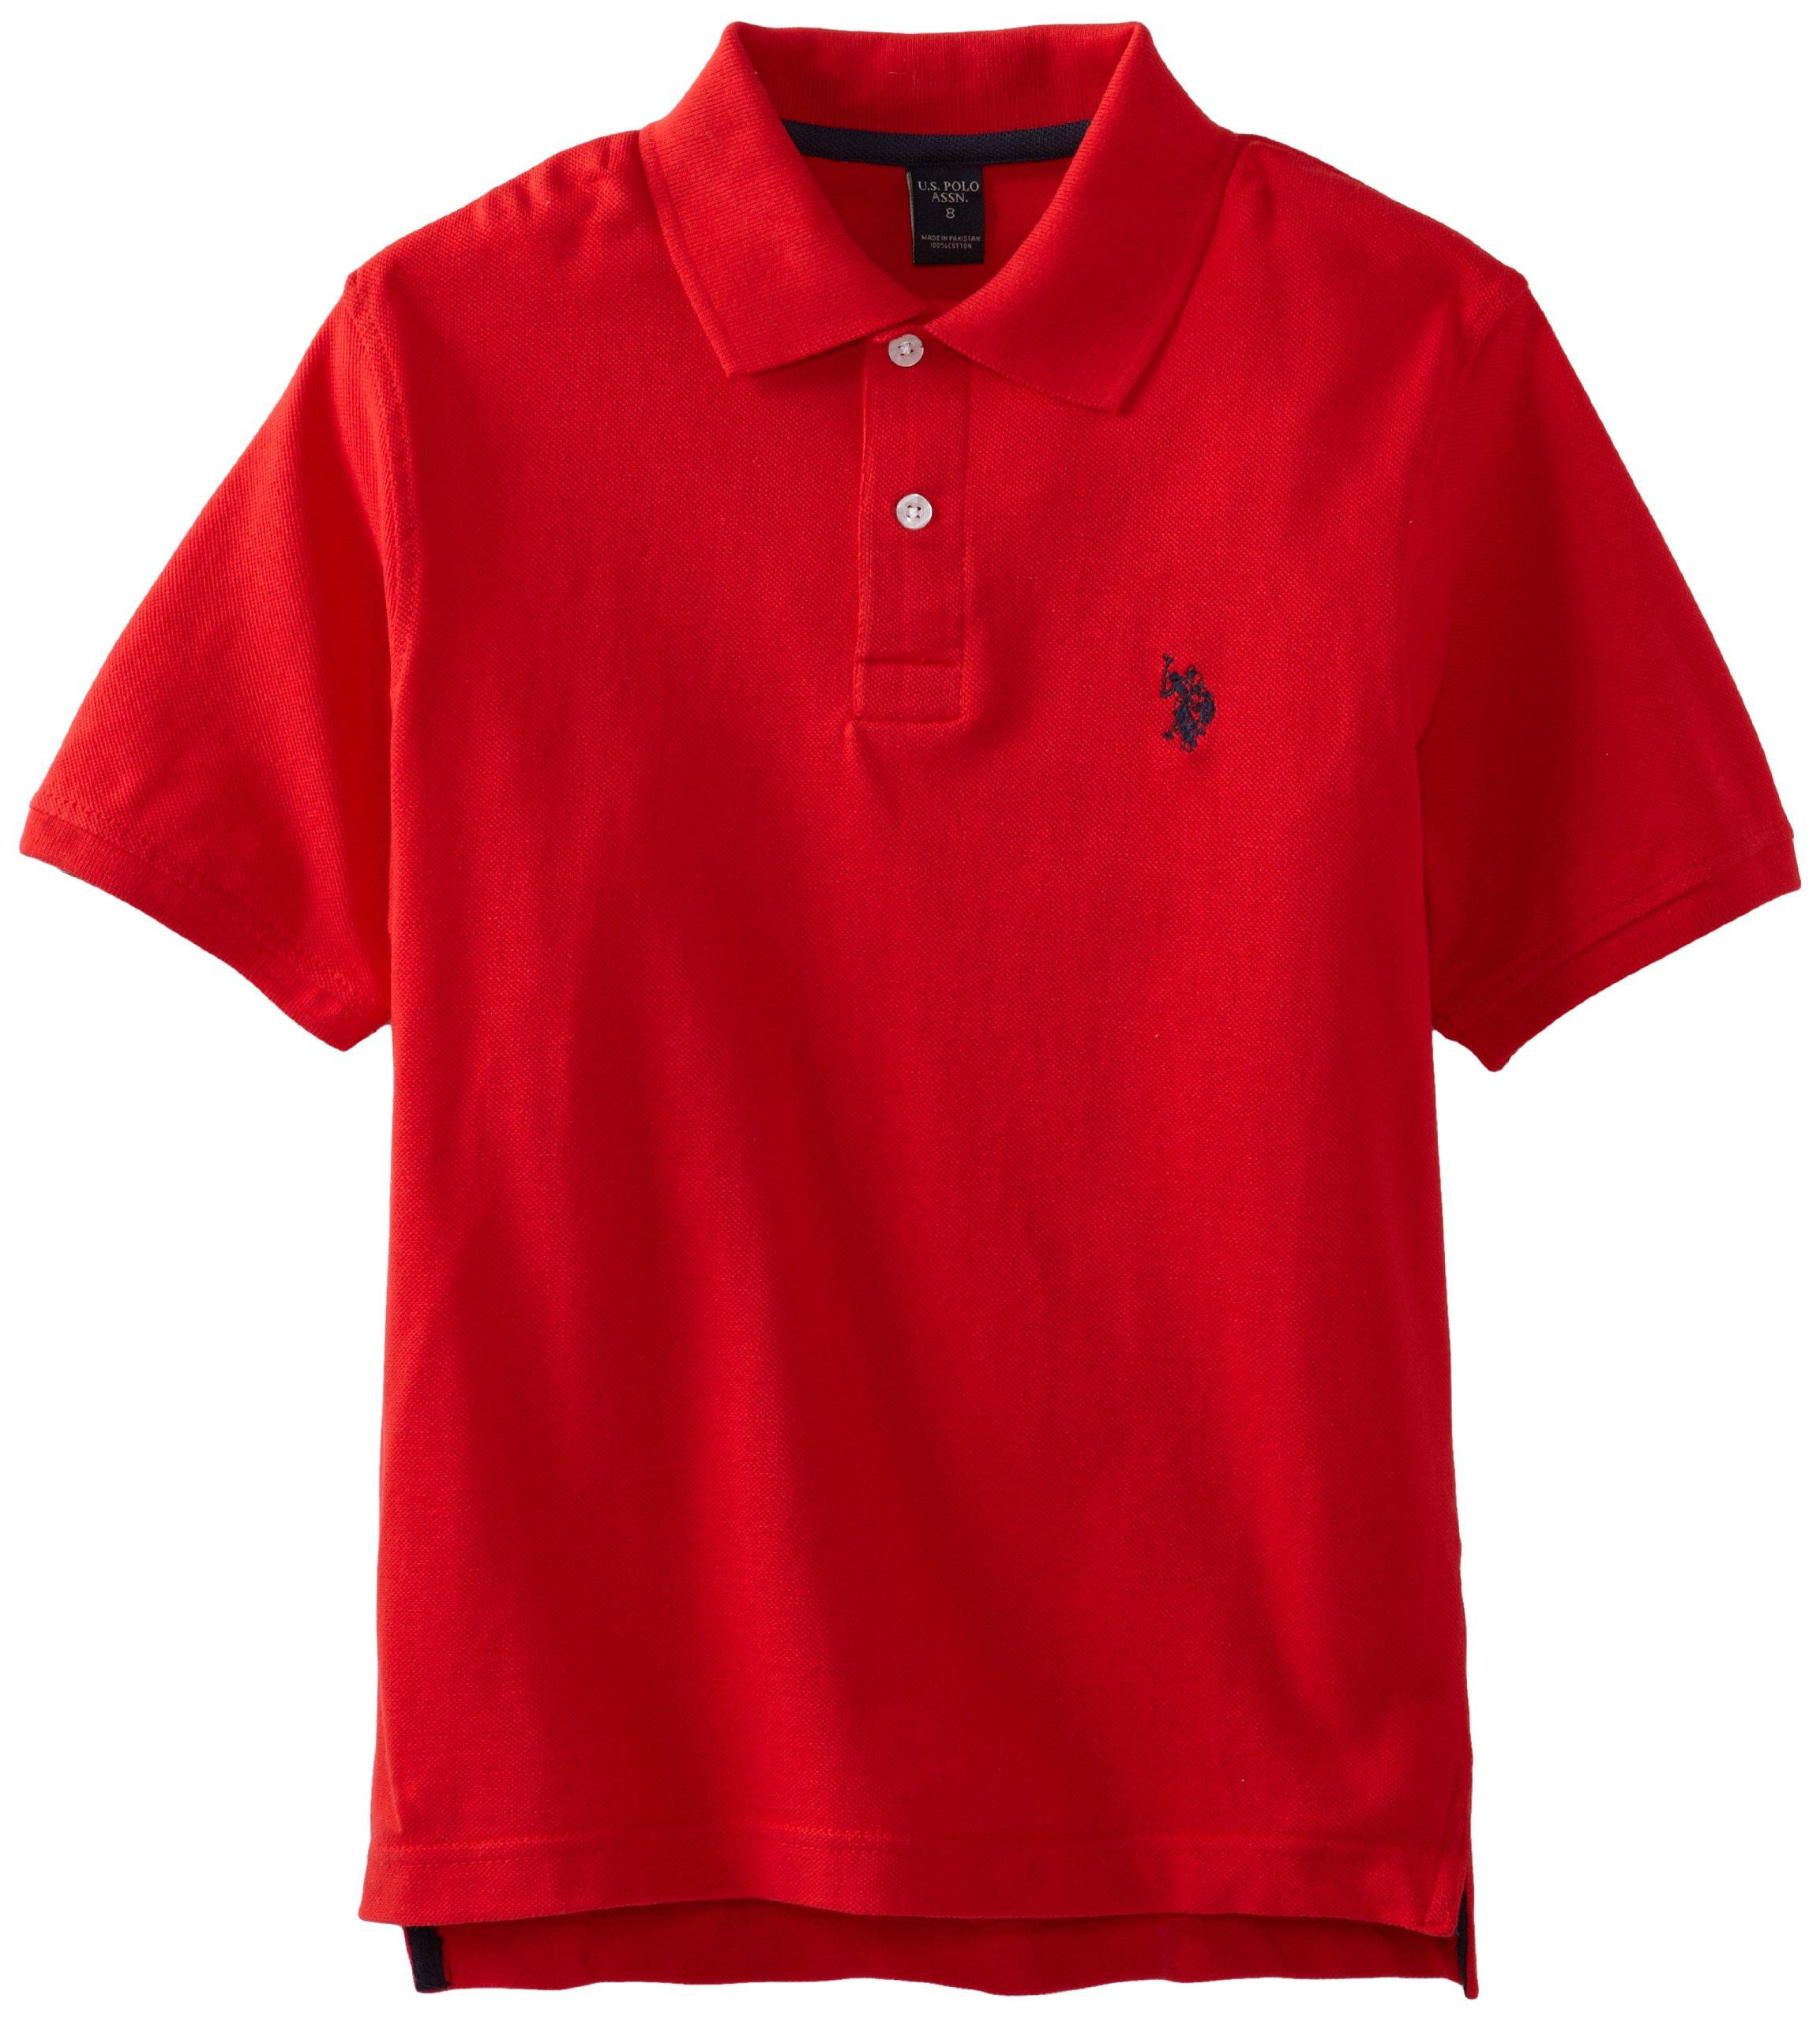 U.S. Polo Assn. Boys' Classic Polo Shirt, Engine Red, 10/12